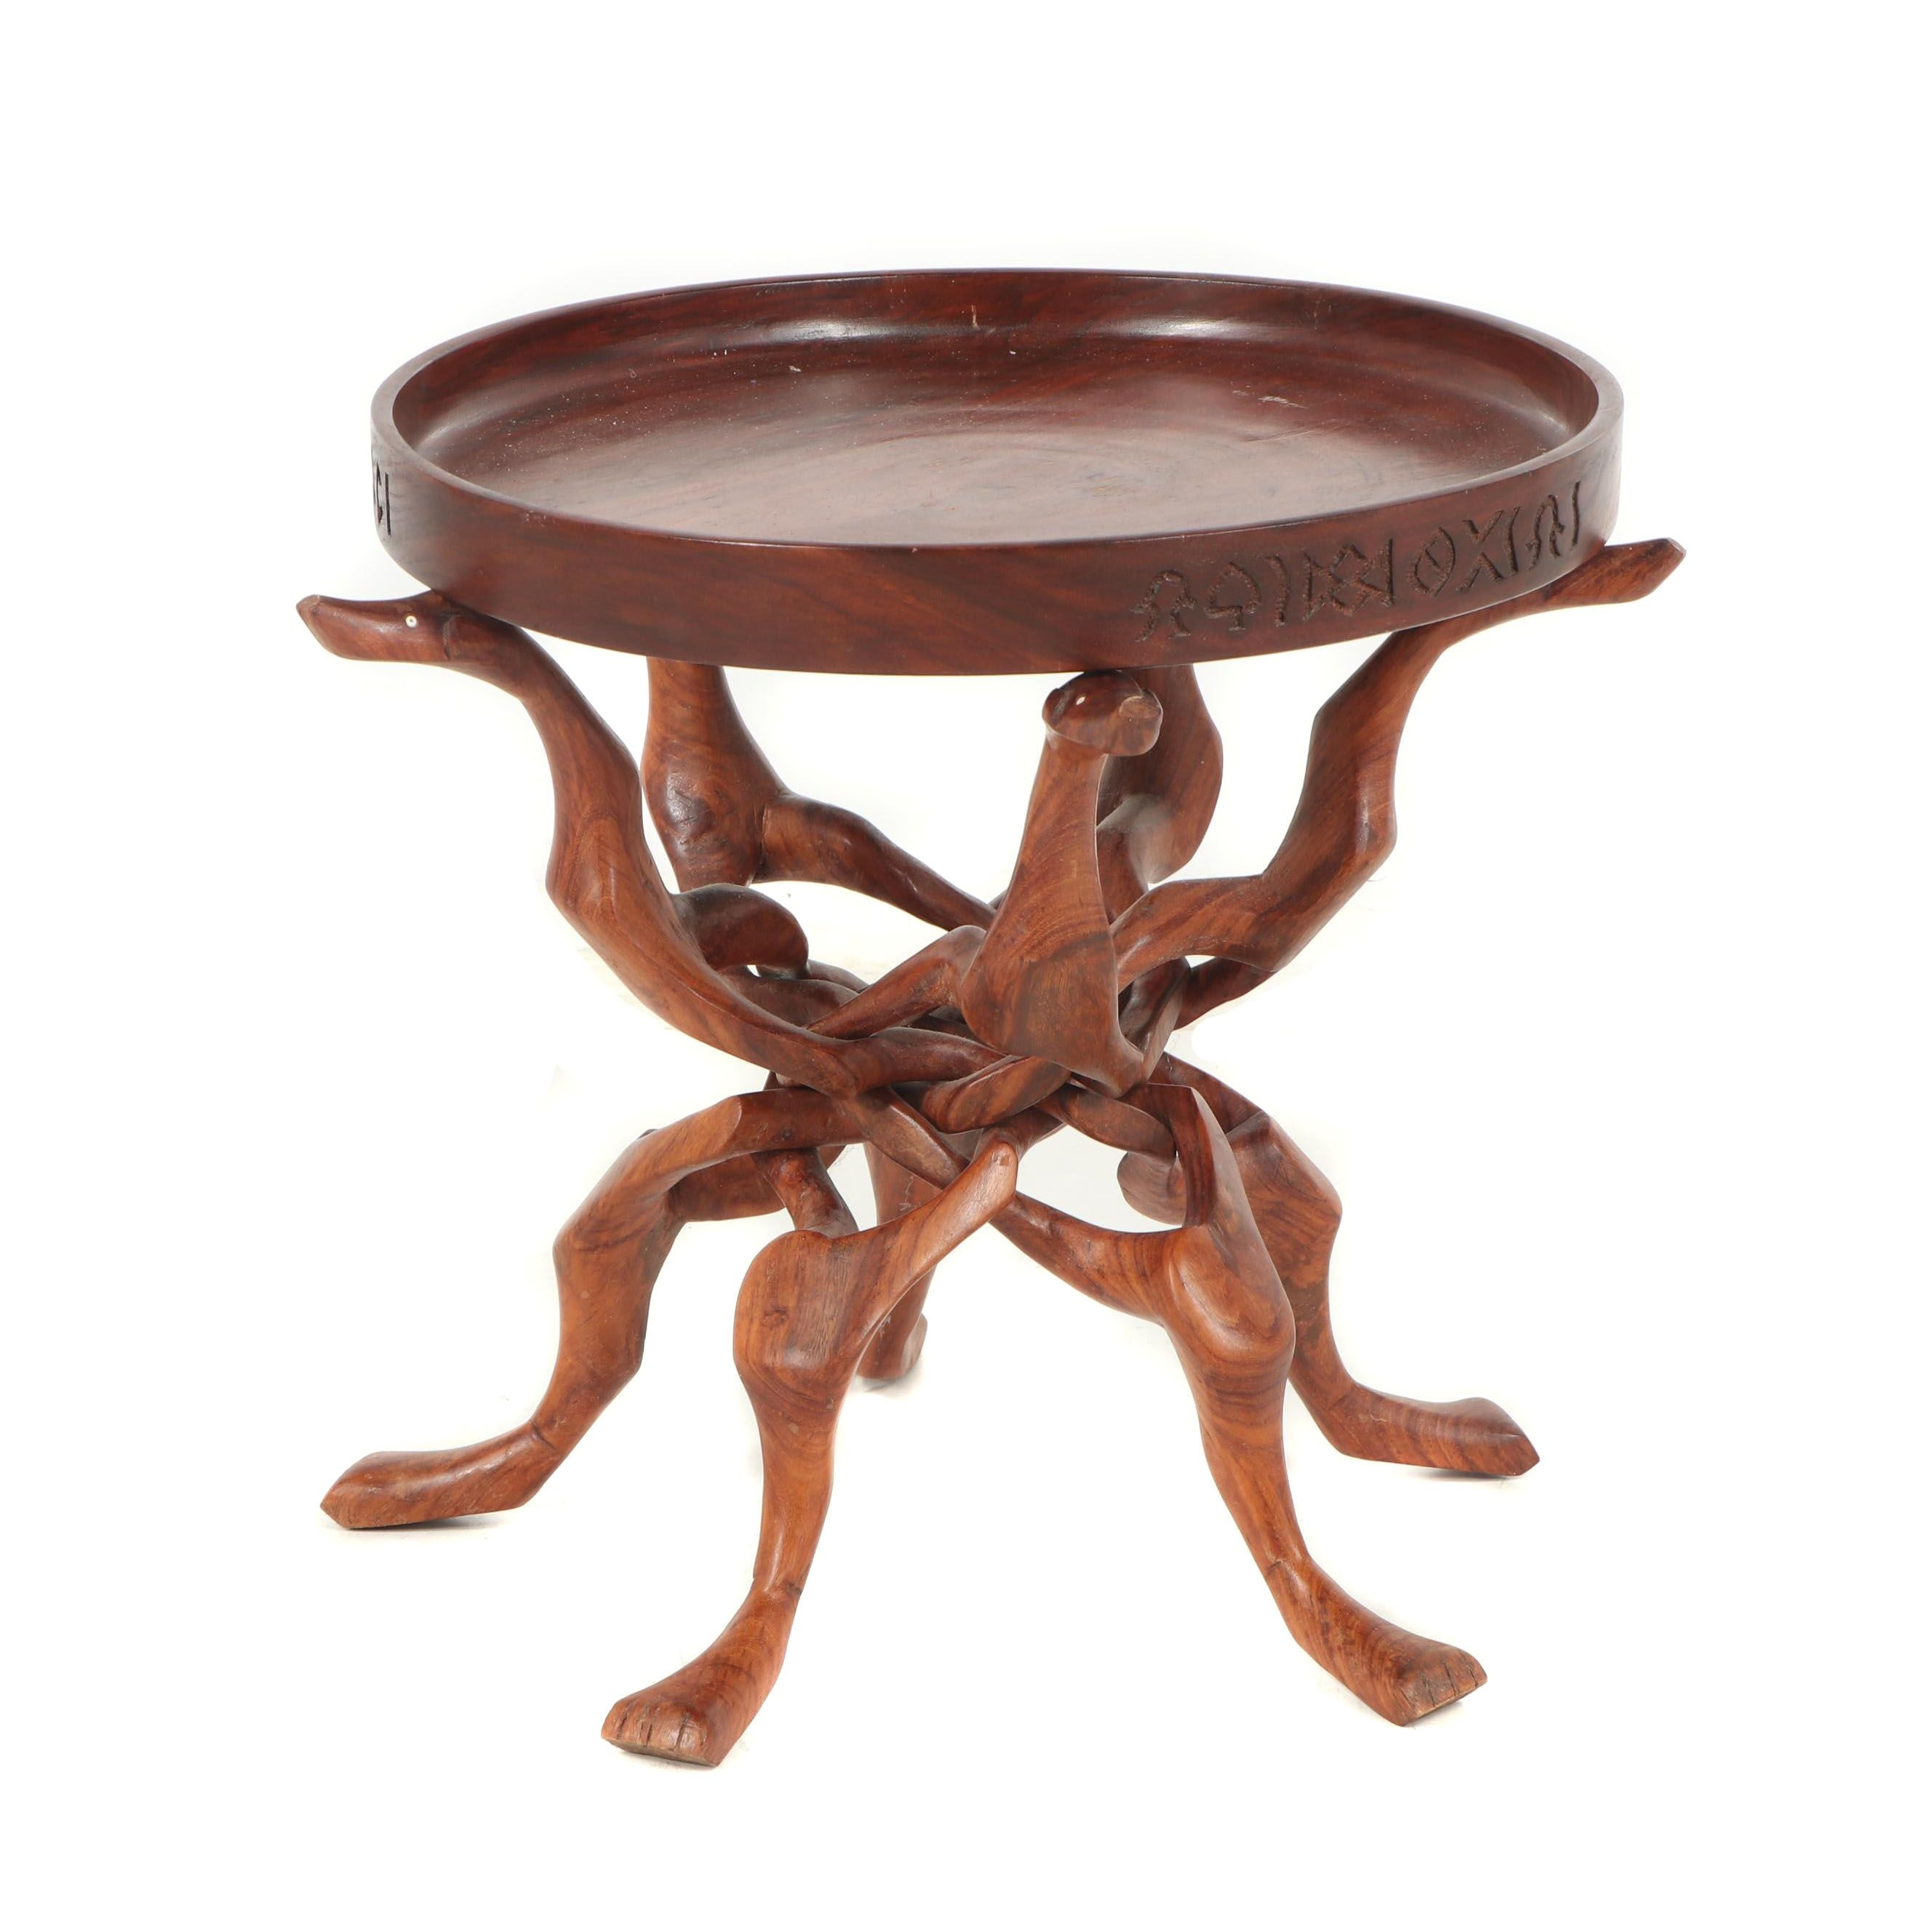 Hardwood Tray Top Table on Interlocking Branch Form Base, 21st Century